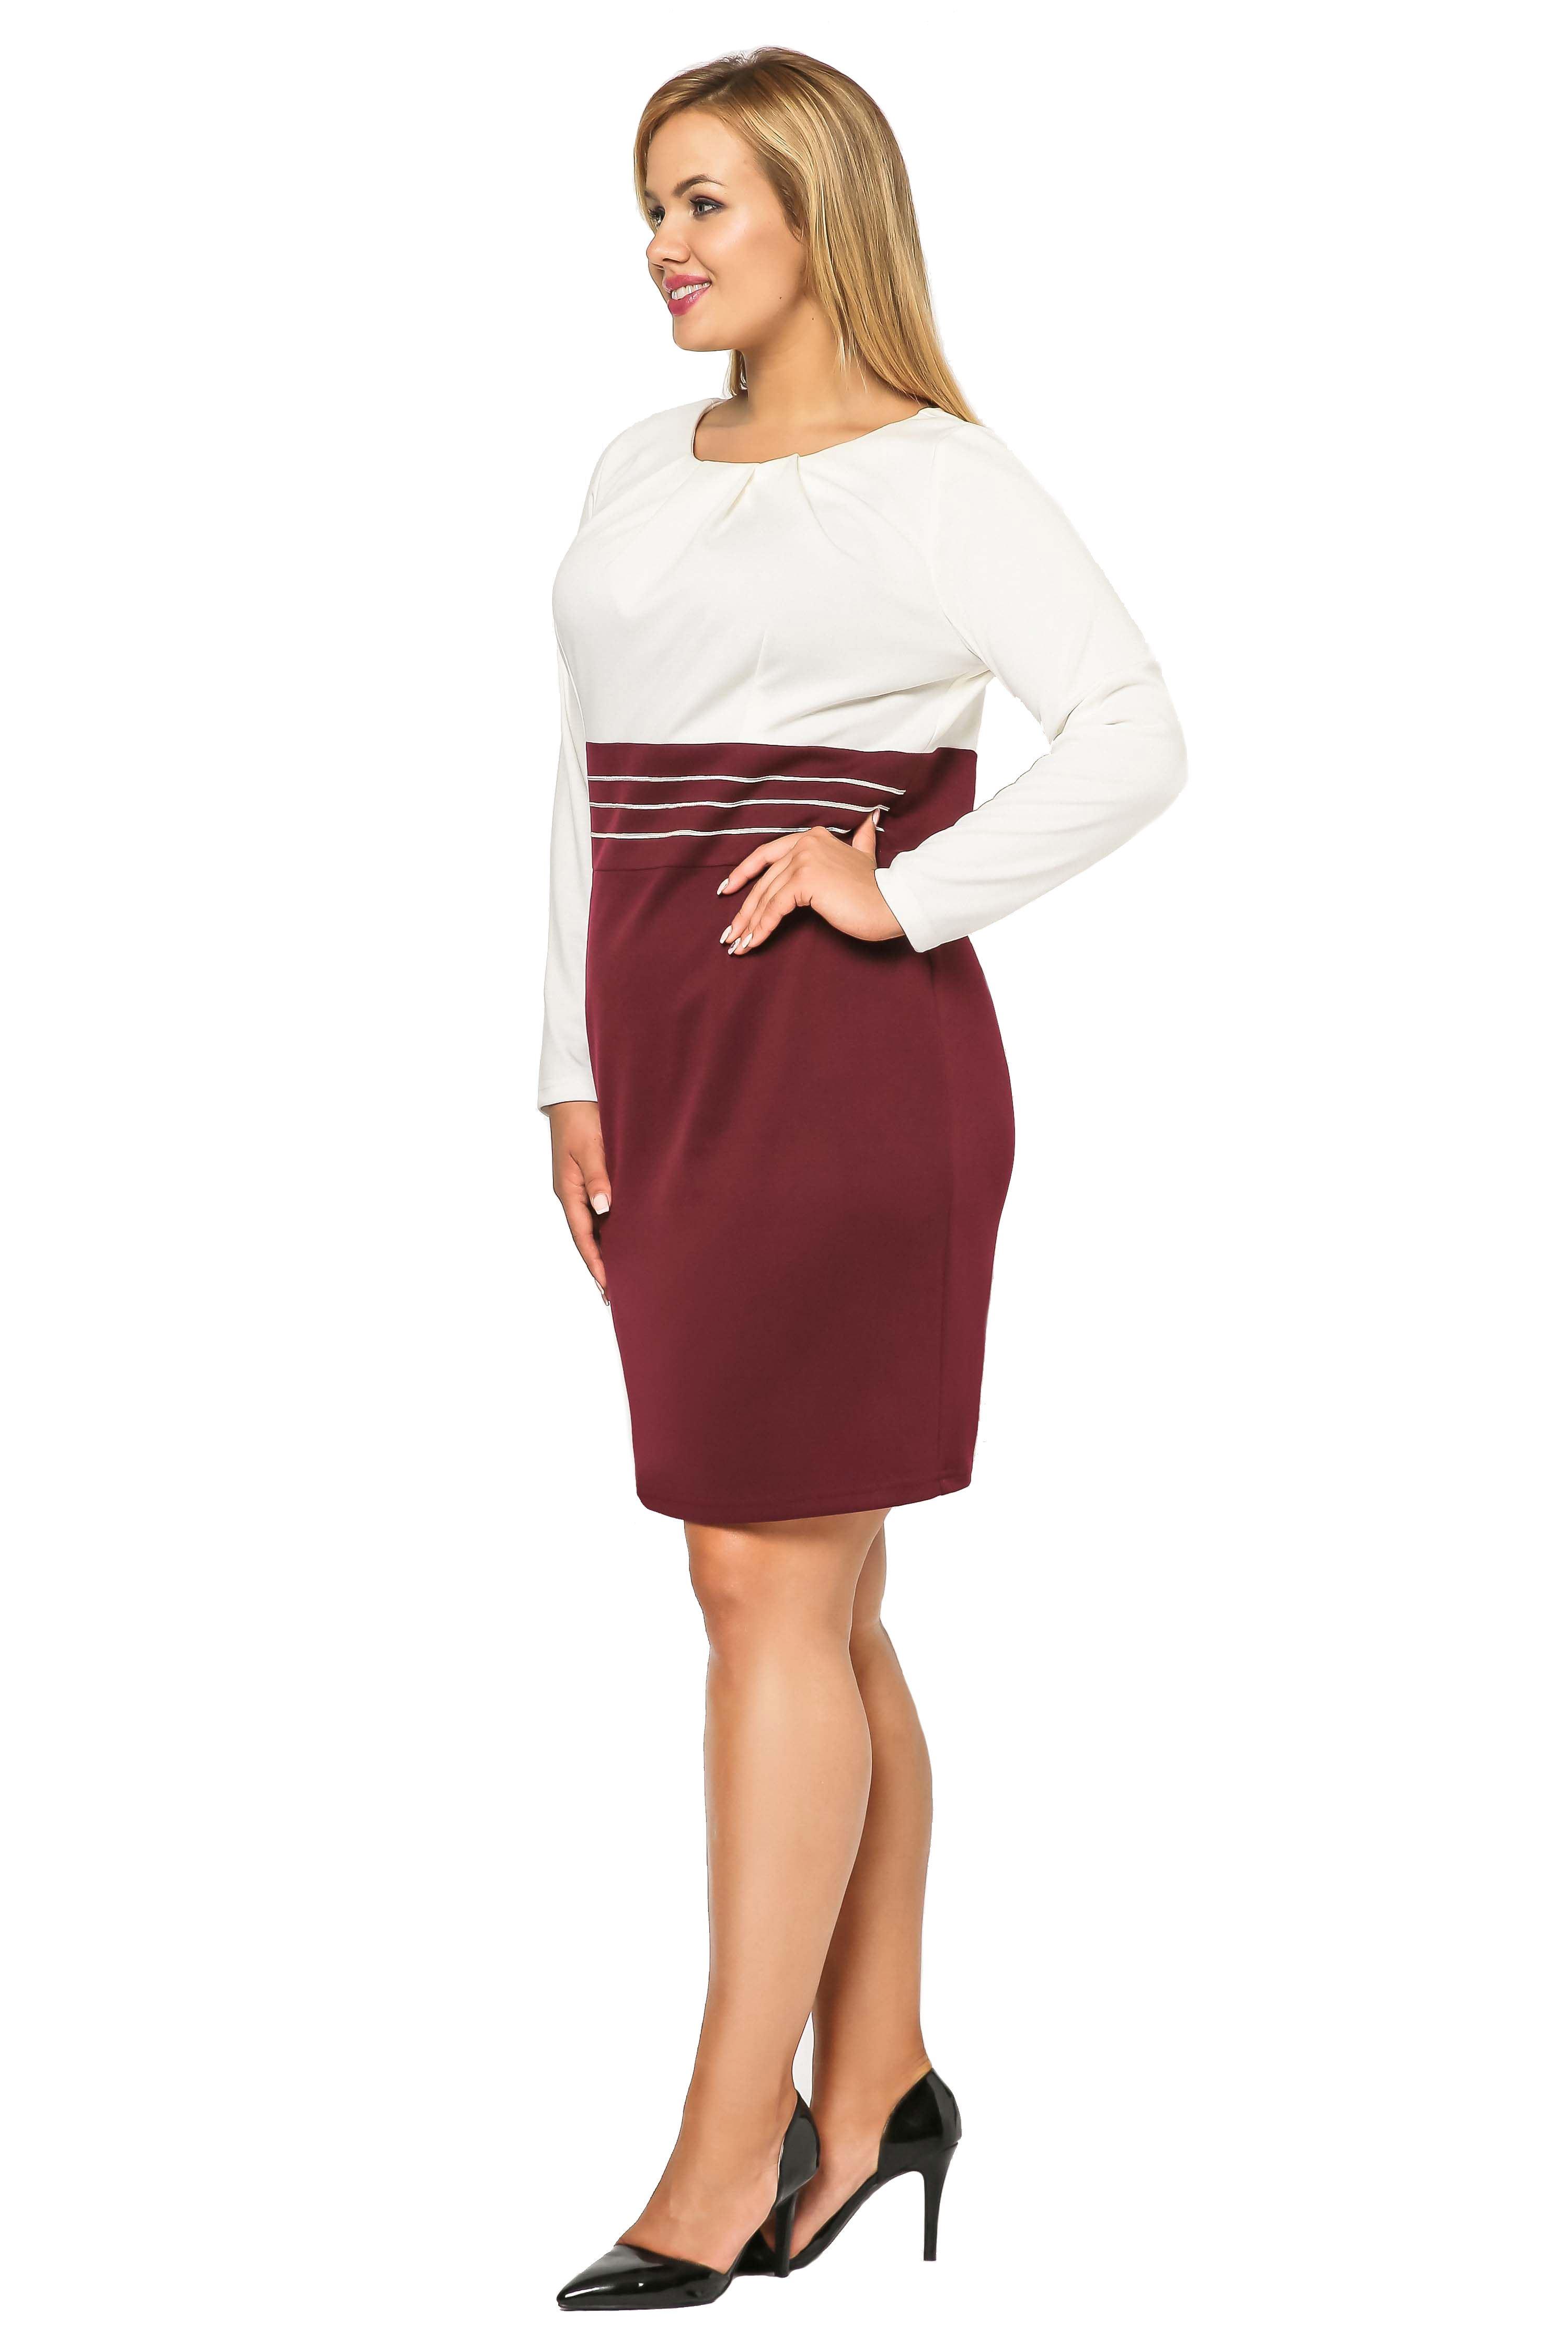 Gabi Knittwear dress, burgundy with ecru